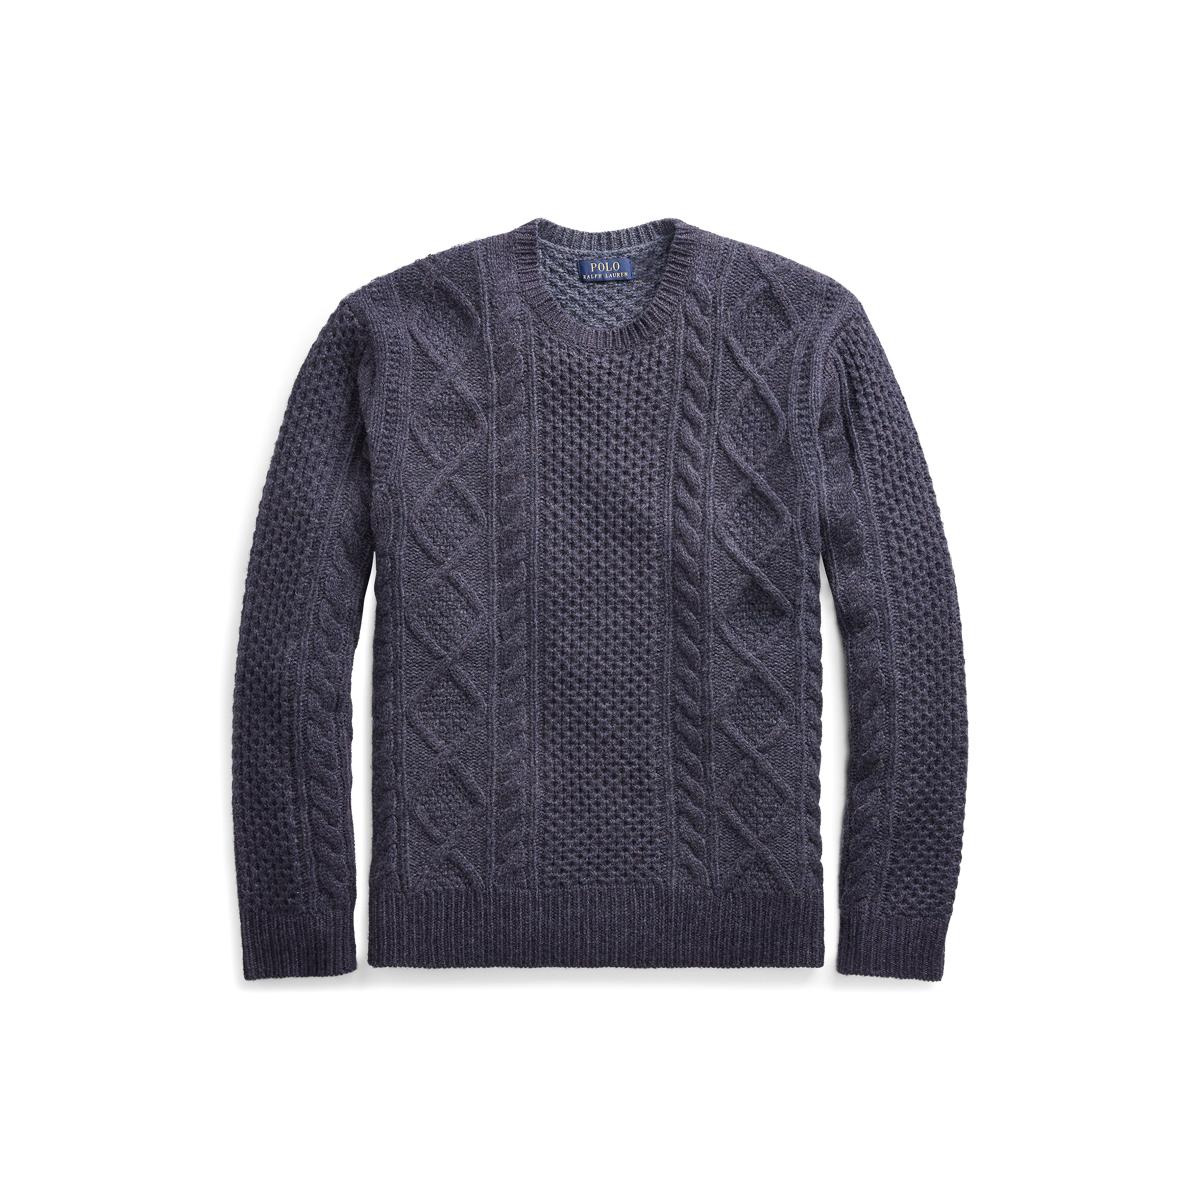 bdbfbf86e0e08c Aran-Knit Wool Sweater